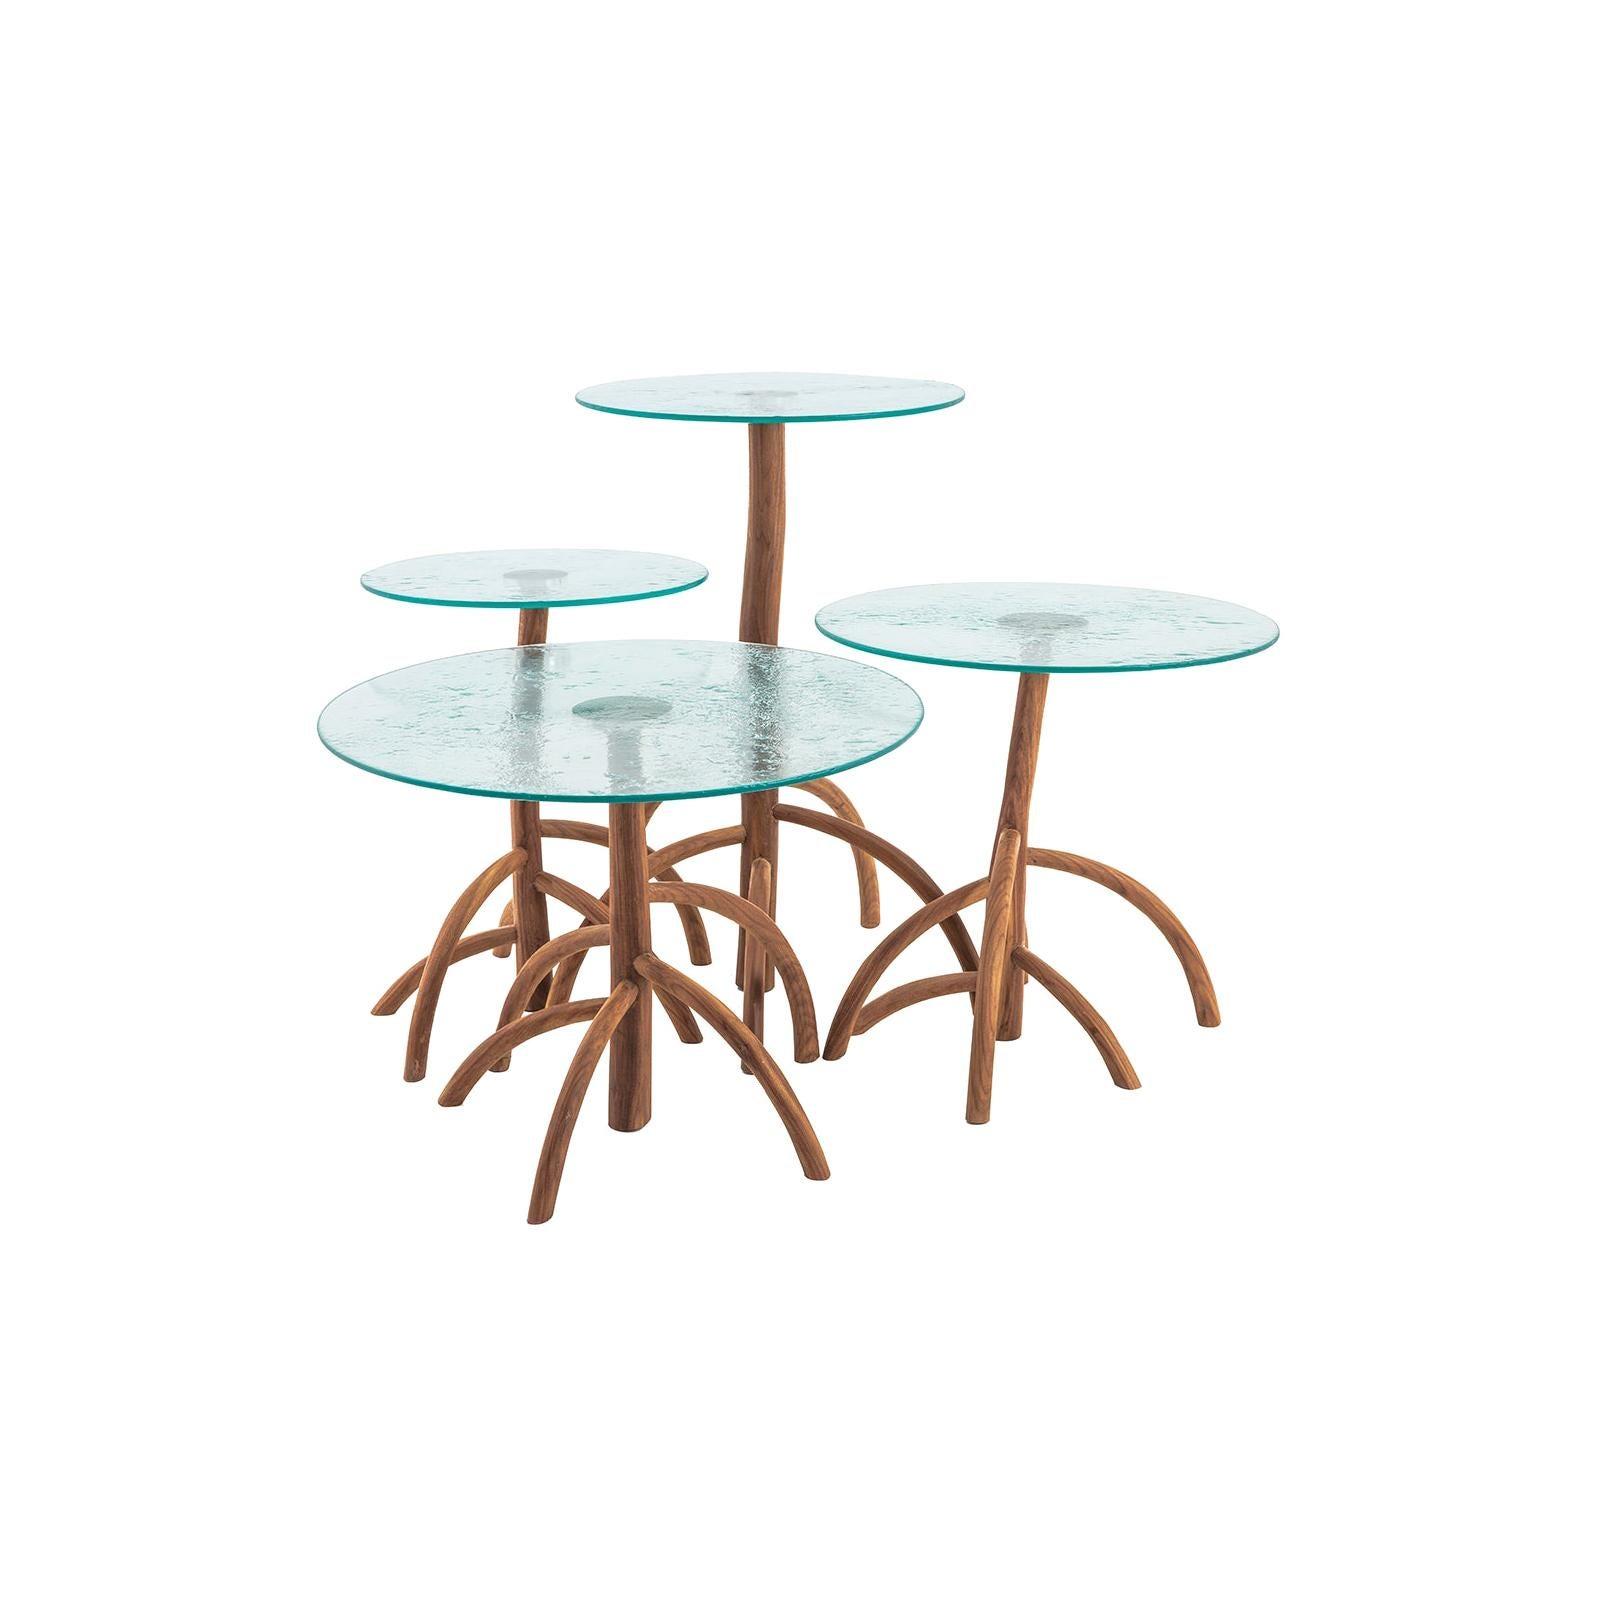 Rossana Orlandi Mangrovia Low Table Set Walnut by Francesco Messina for Cypraea